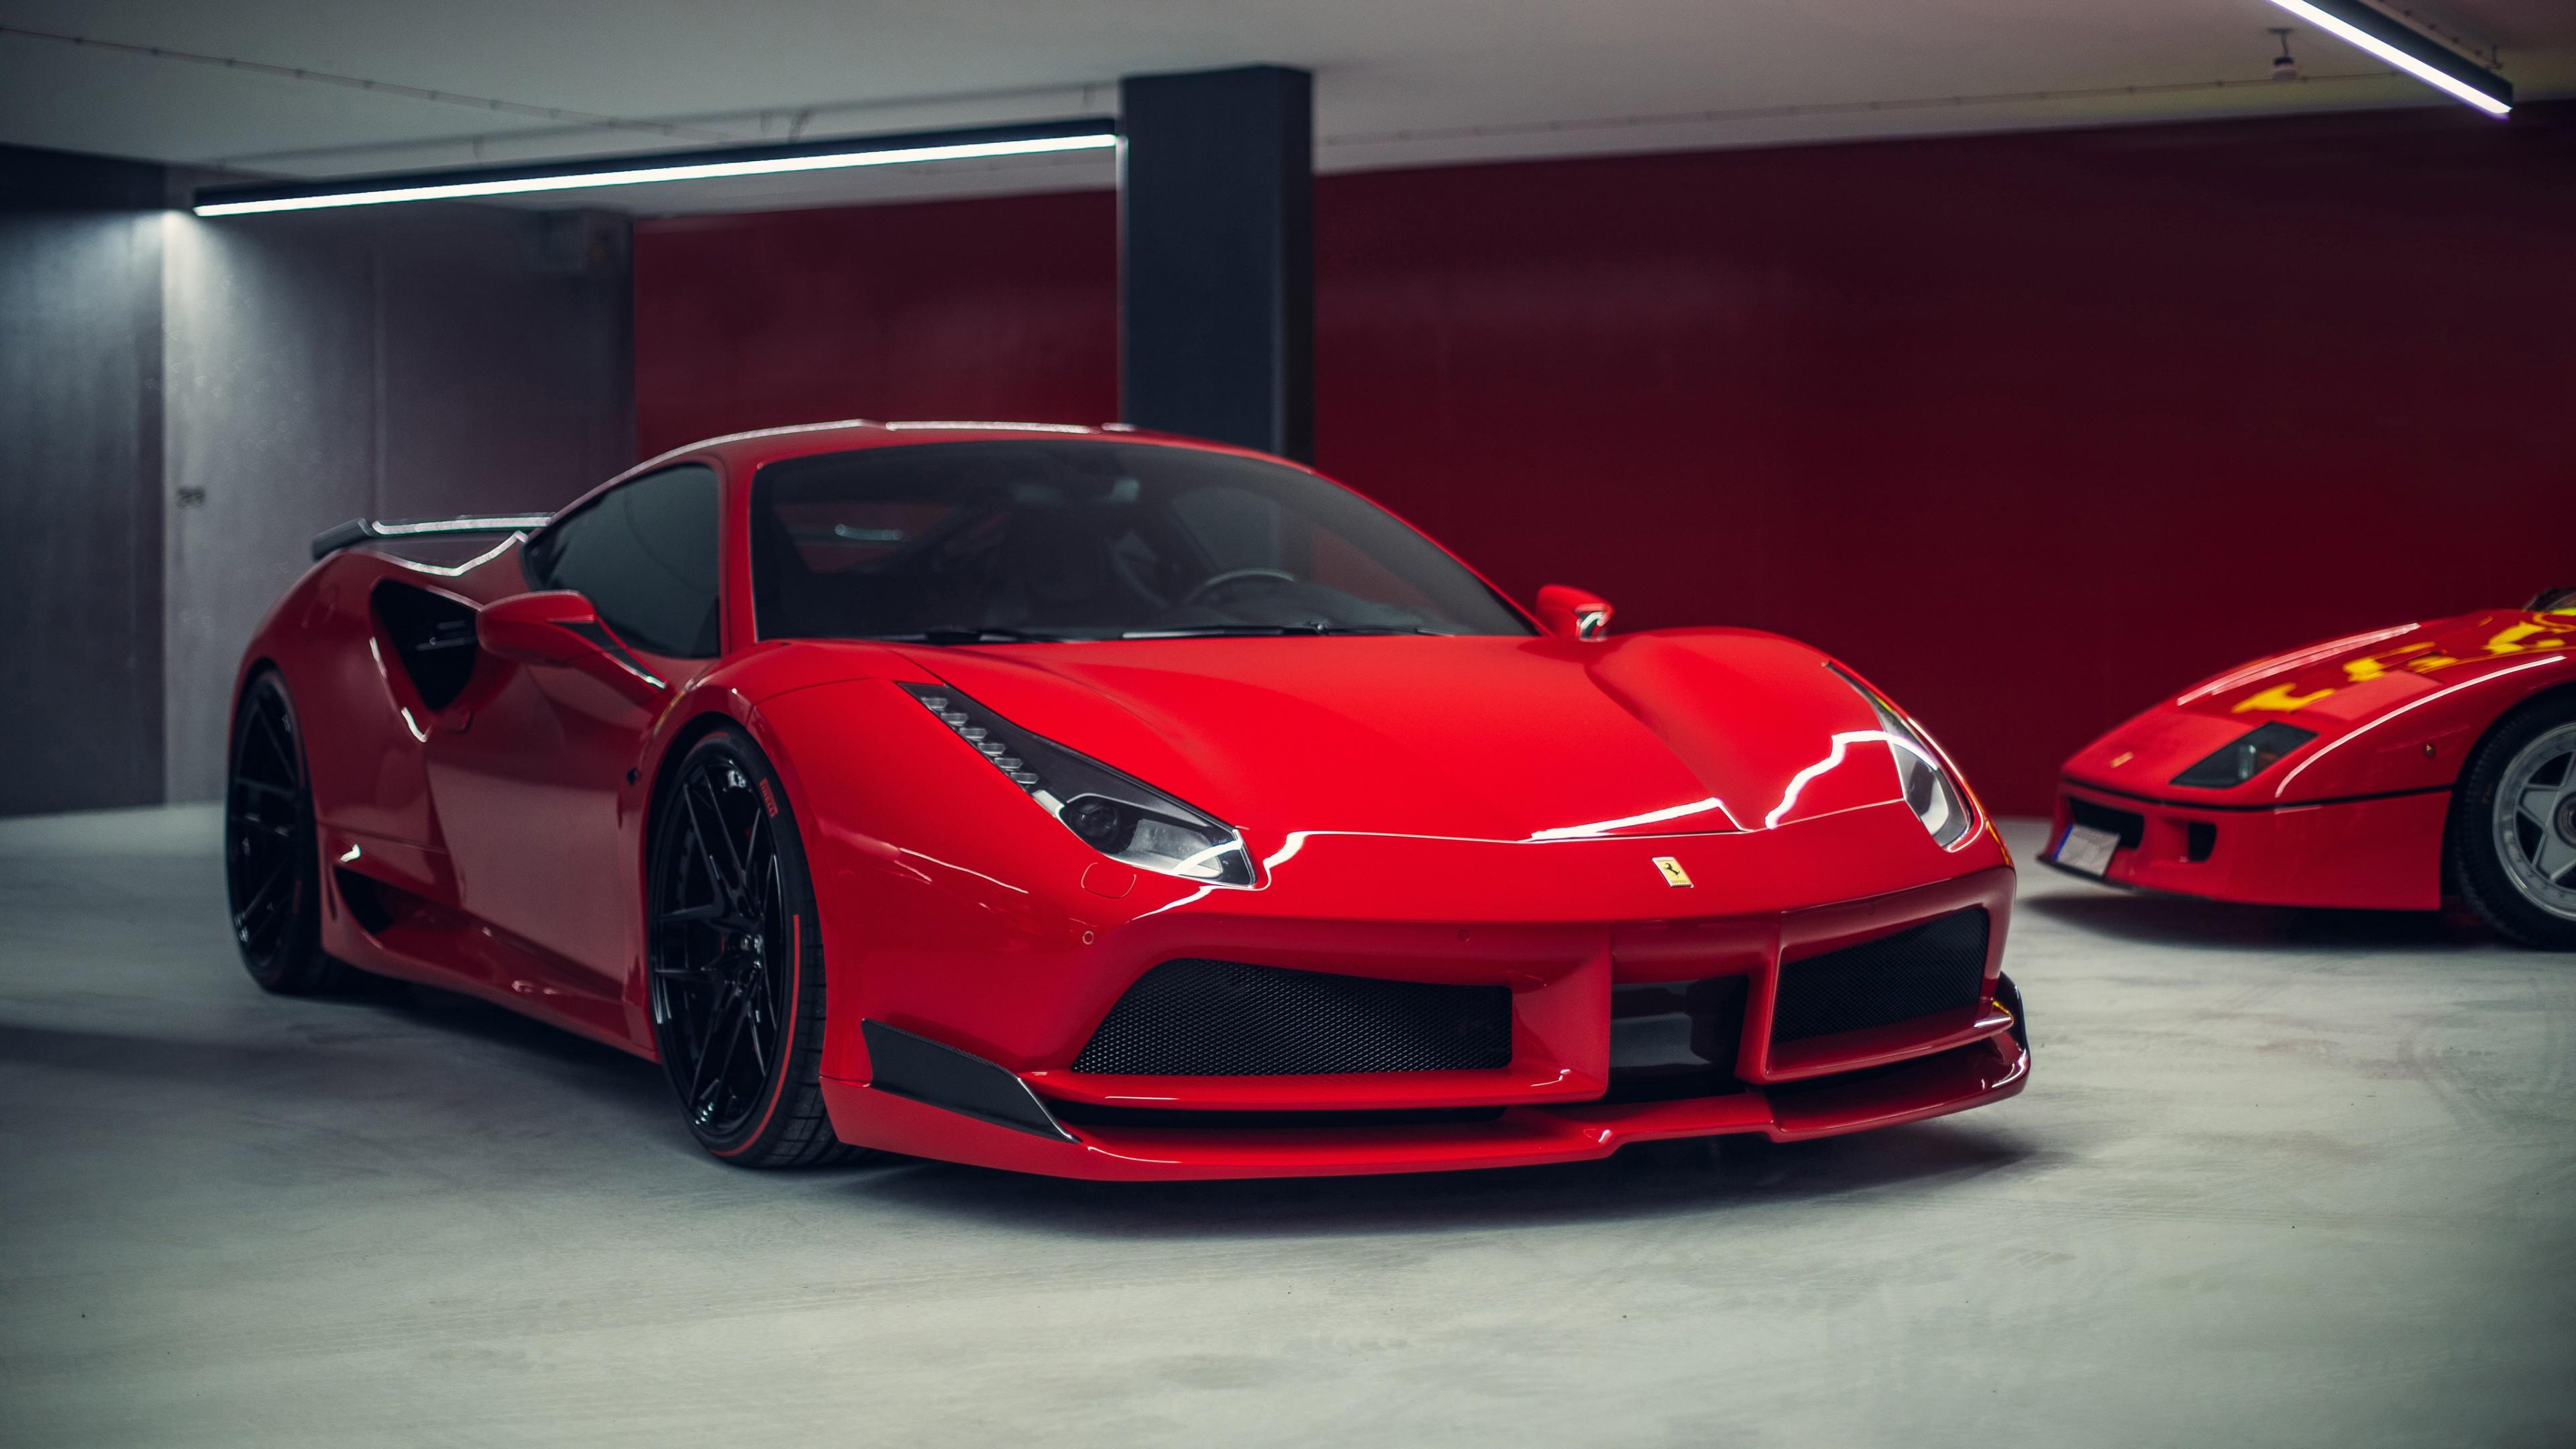 Ferrari 458 Italia Wallpaper Hd Novitec N Largo Ferrari 488 Gtb 6 Wallpaper Hd Car